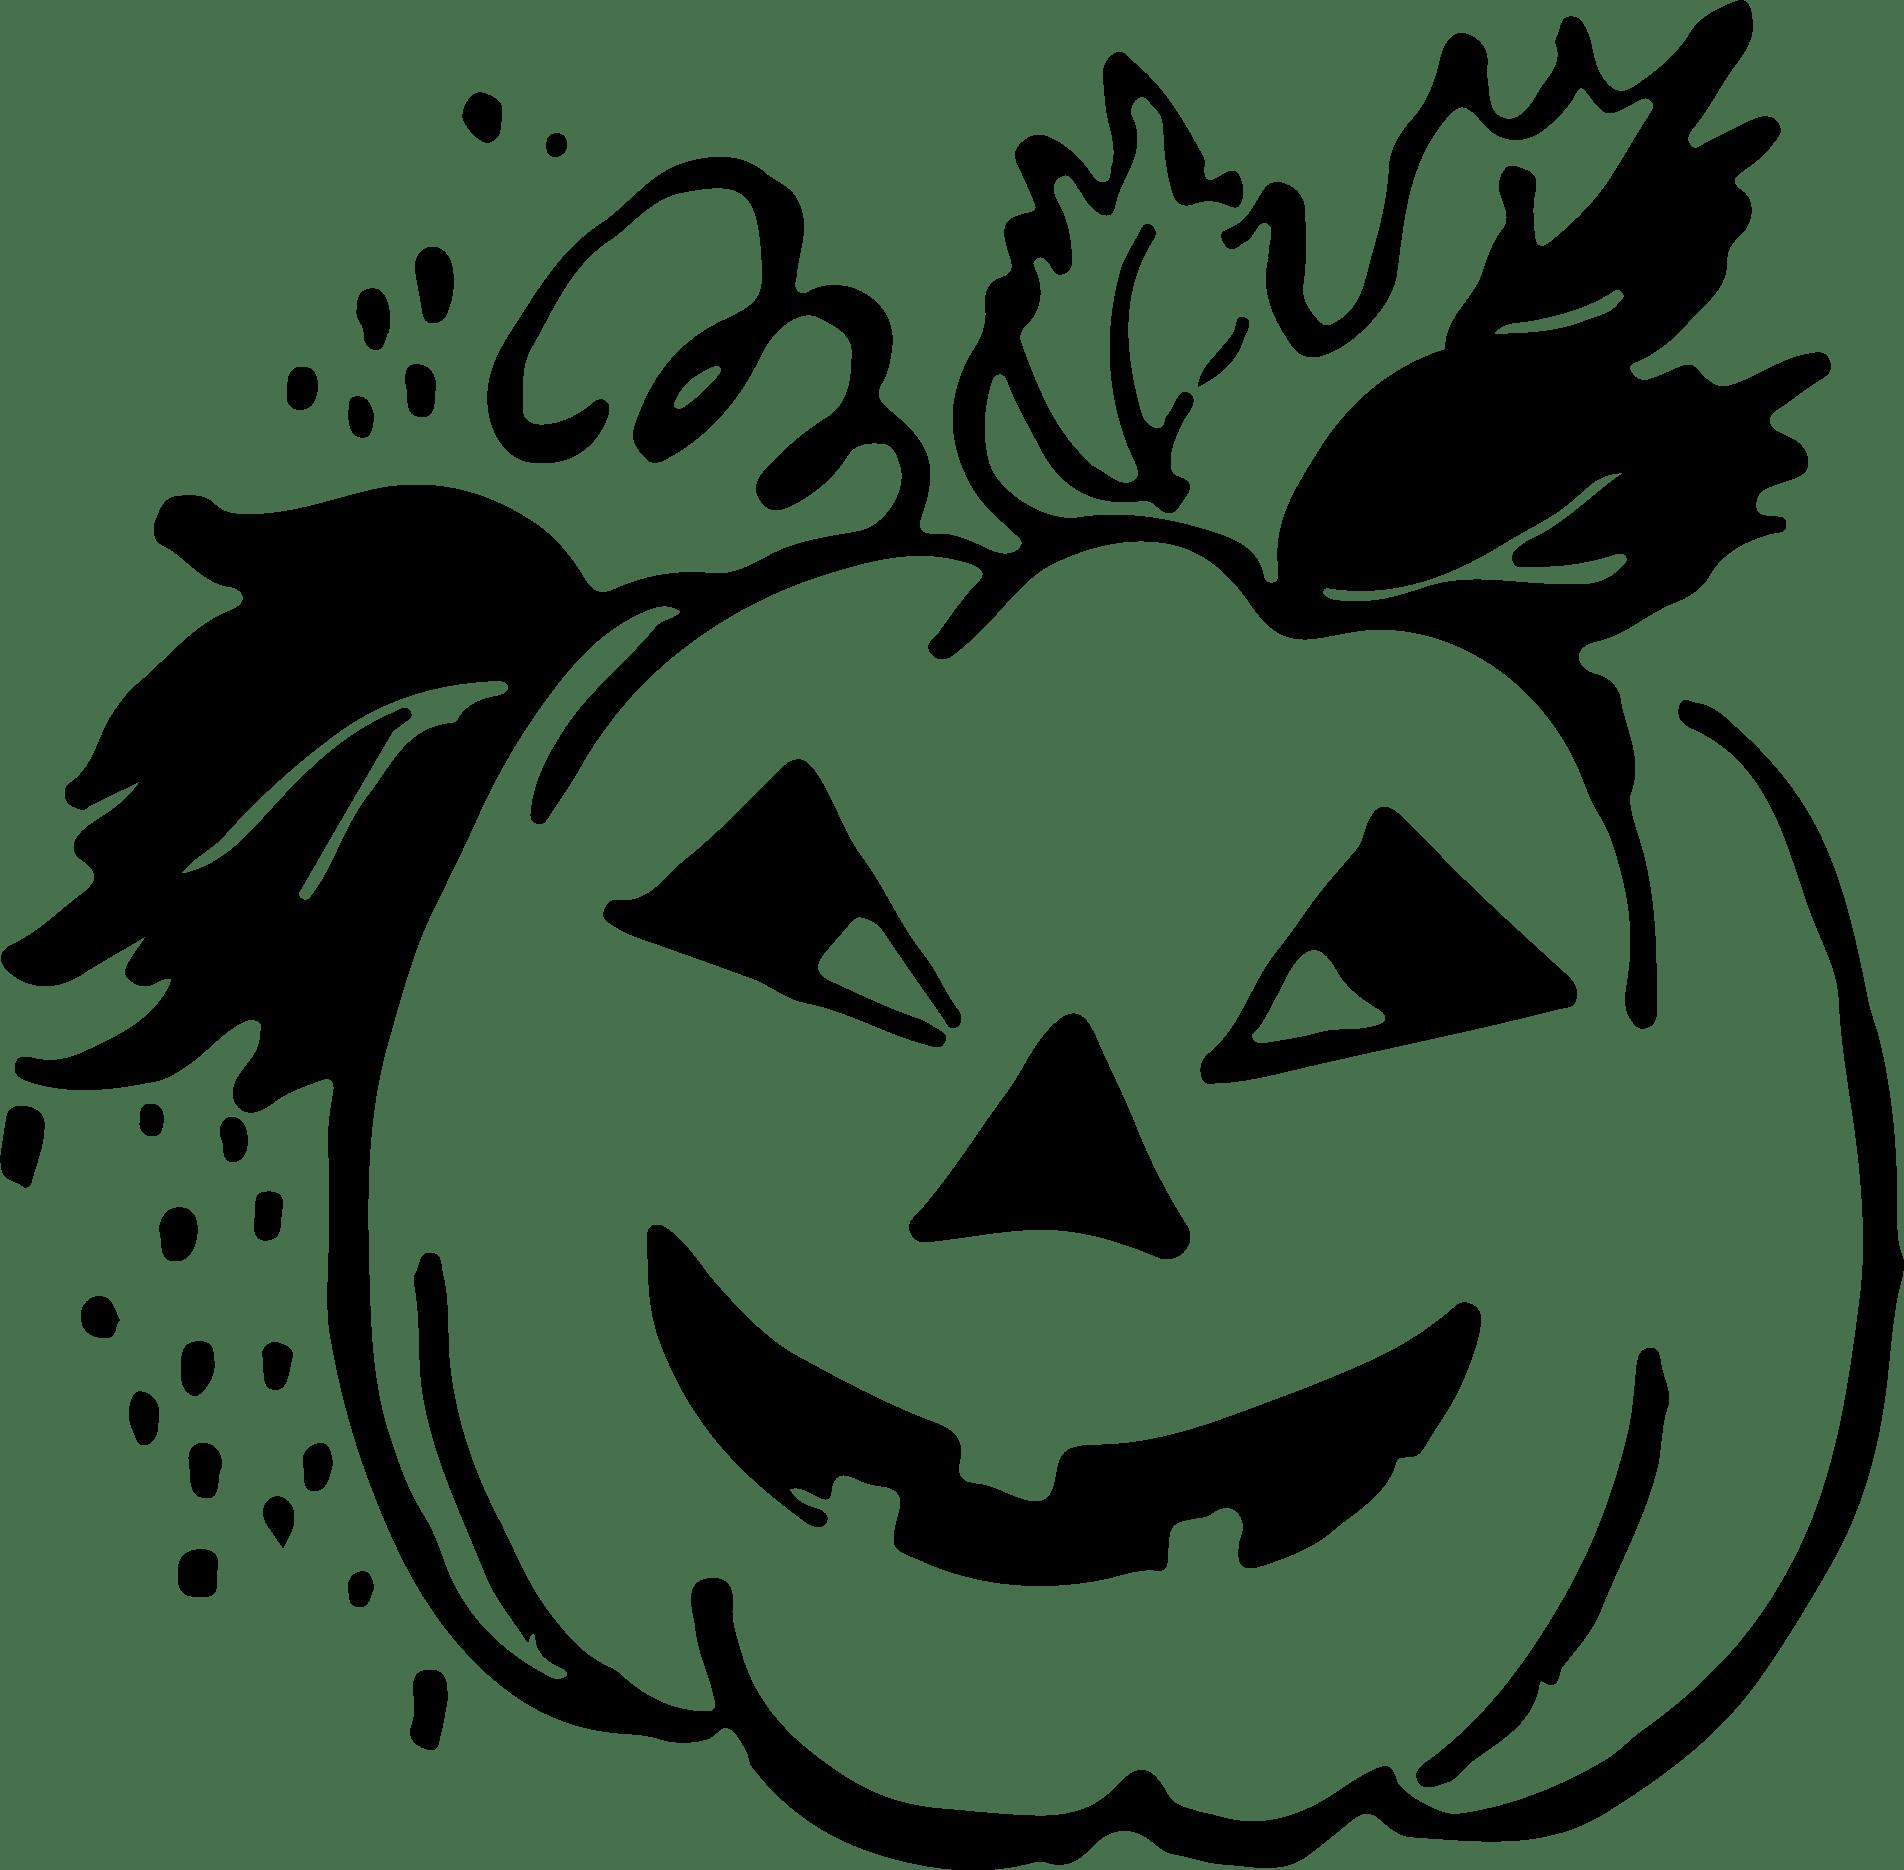 Halloween Clip Art For Kids And Teachers